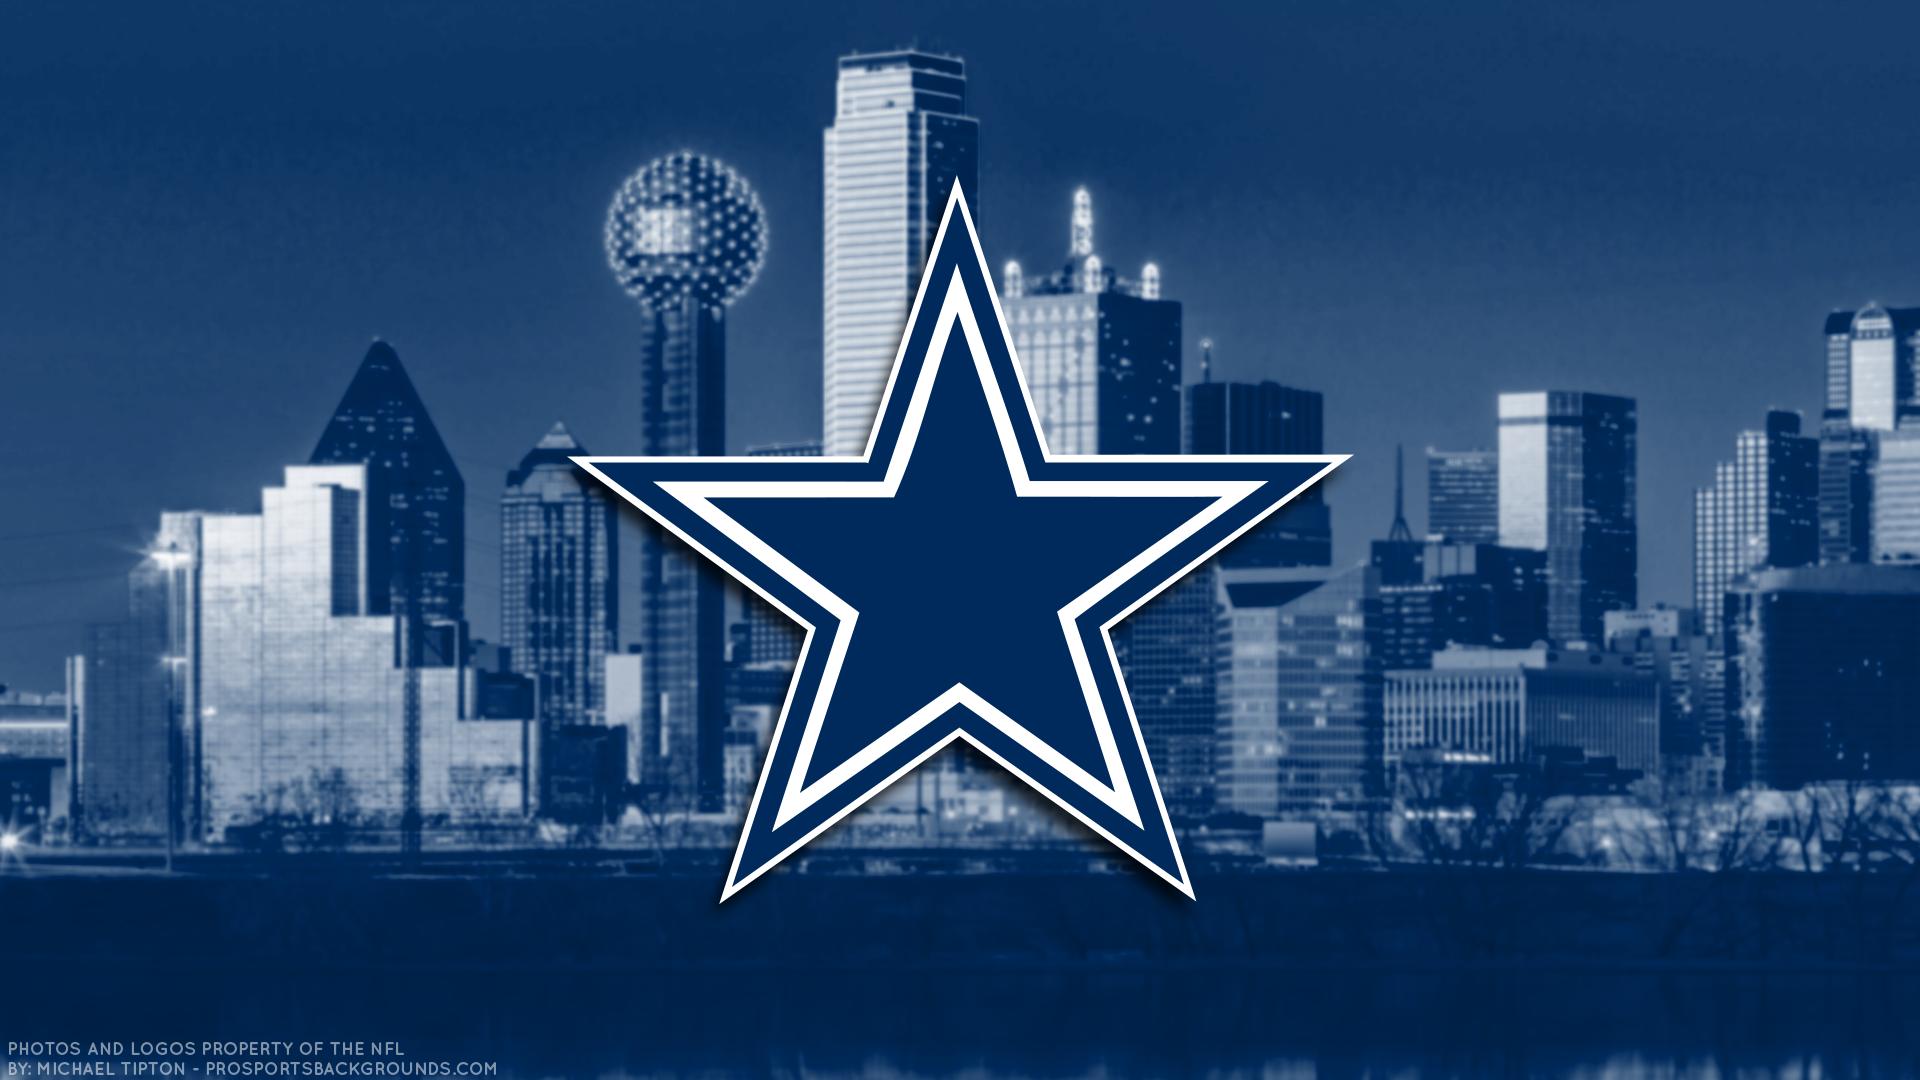 Dal City Png 1920 1080 Dallas Cowboys Logo Dallas Cowboys Super